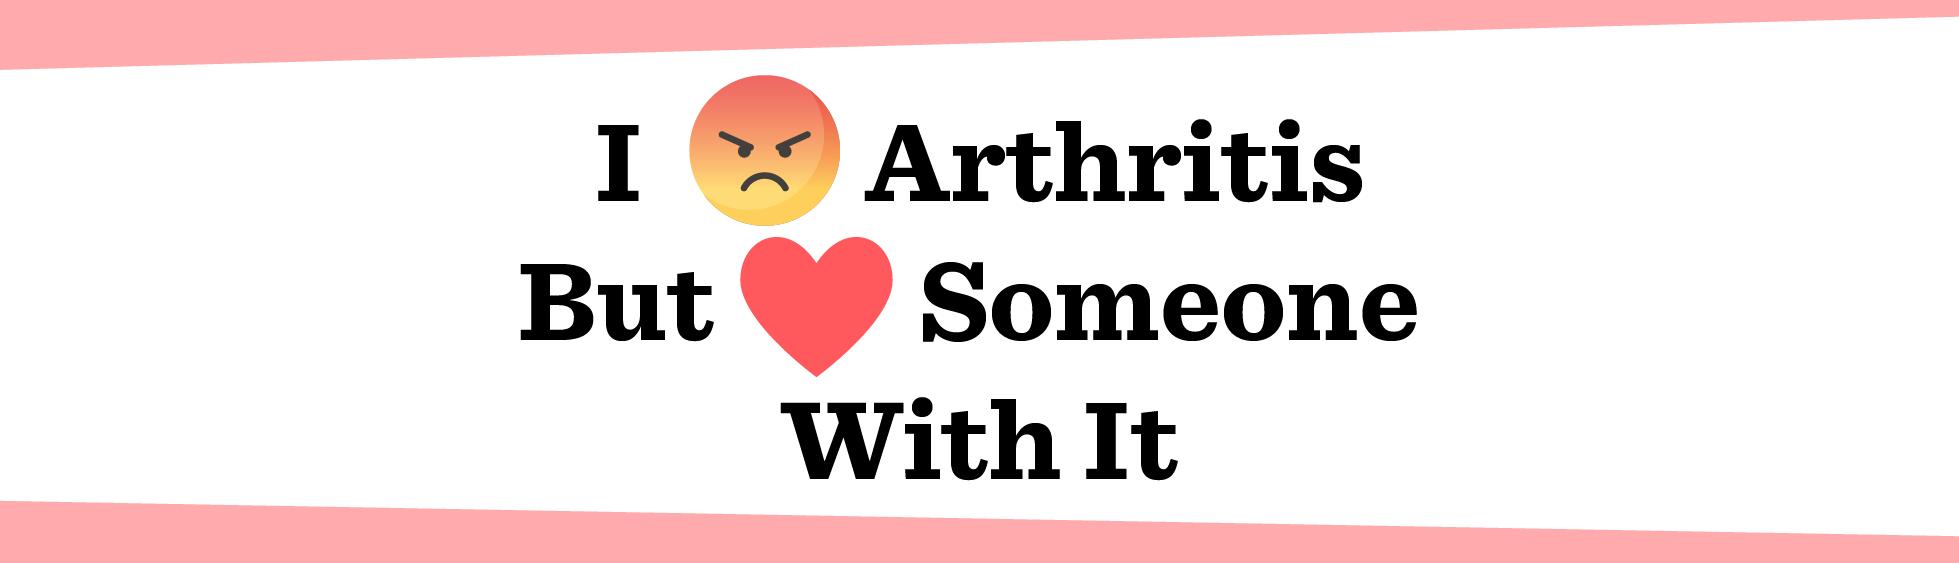 I Hate Arthritis. But I Love Someone Who Has It.